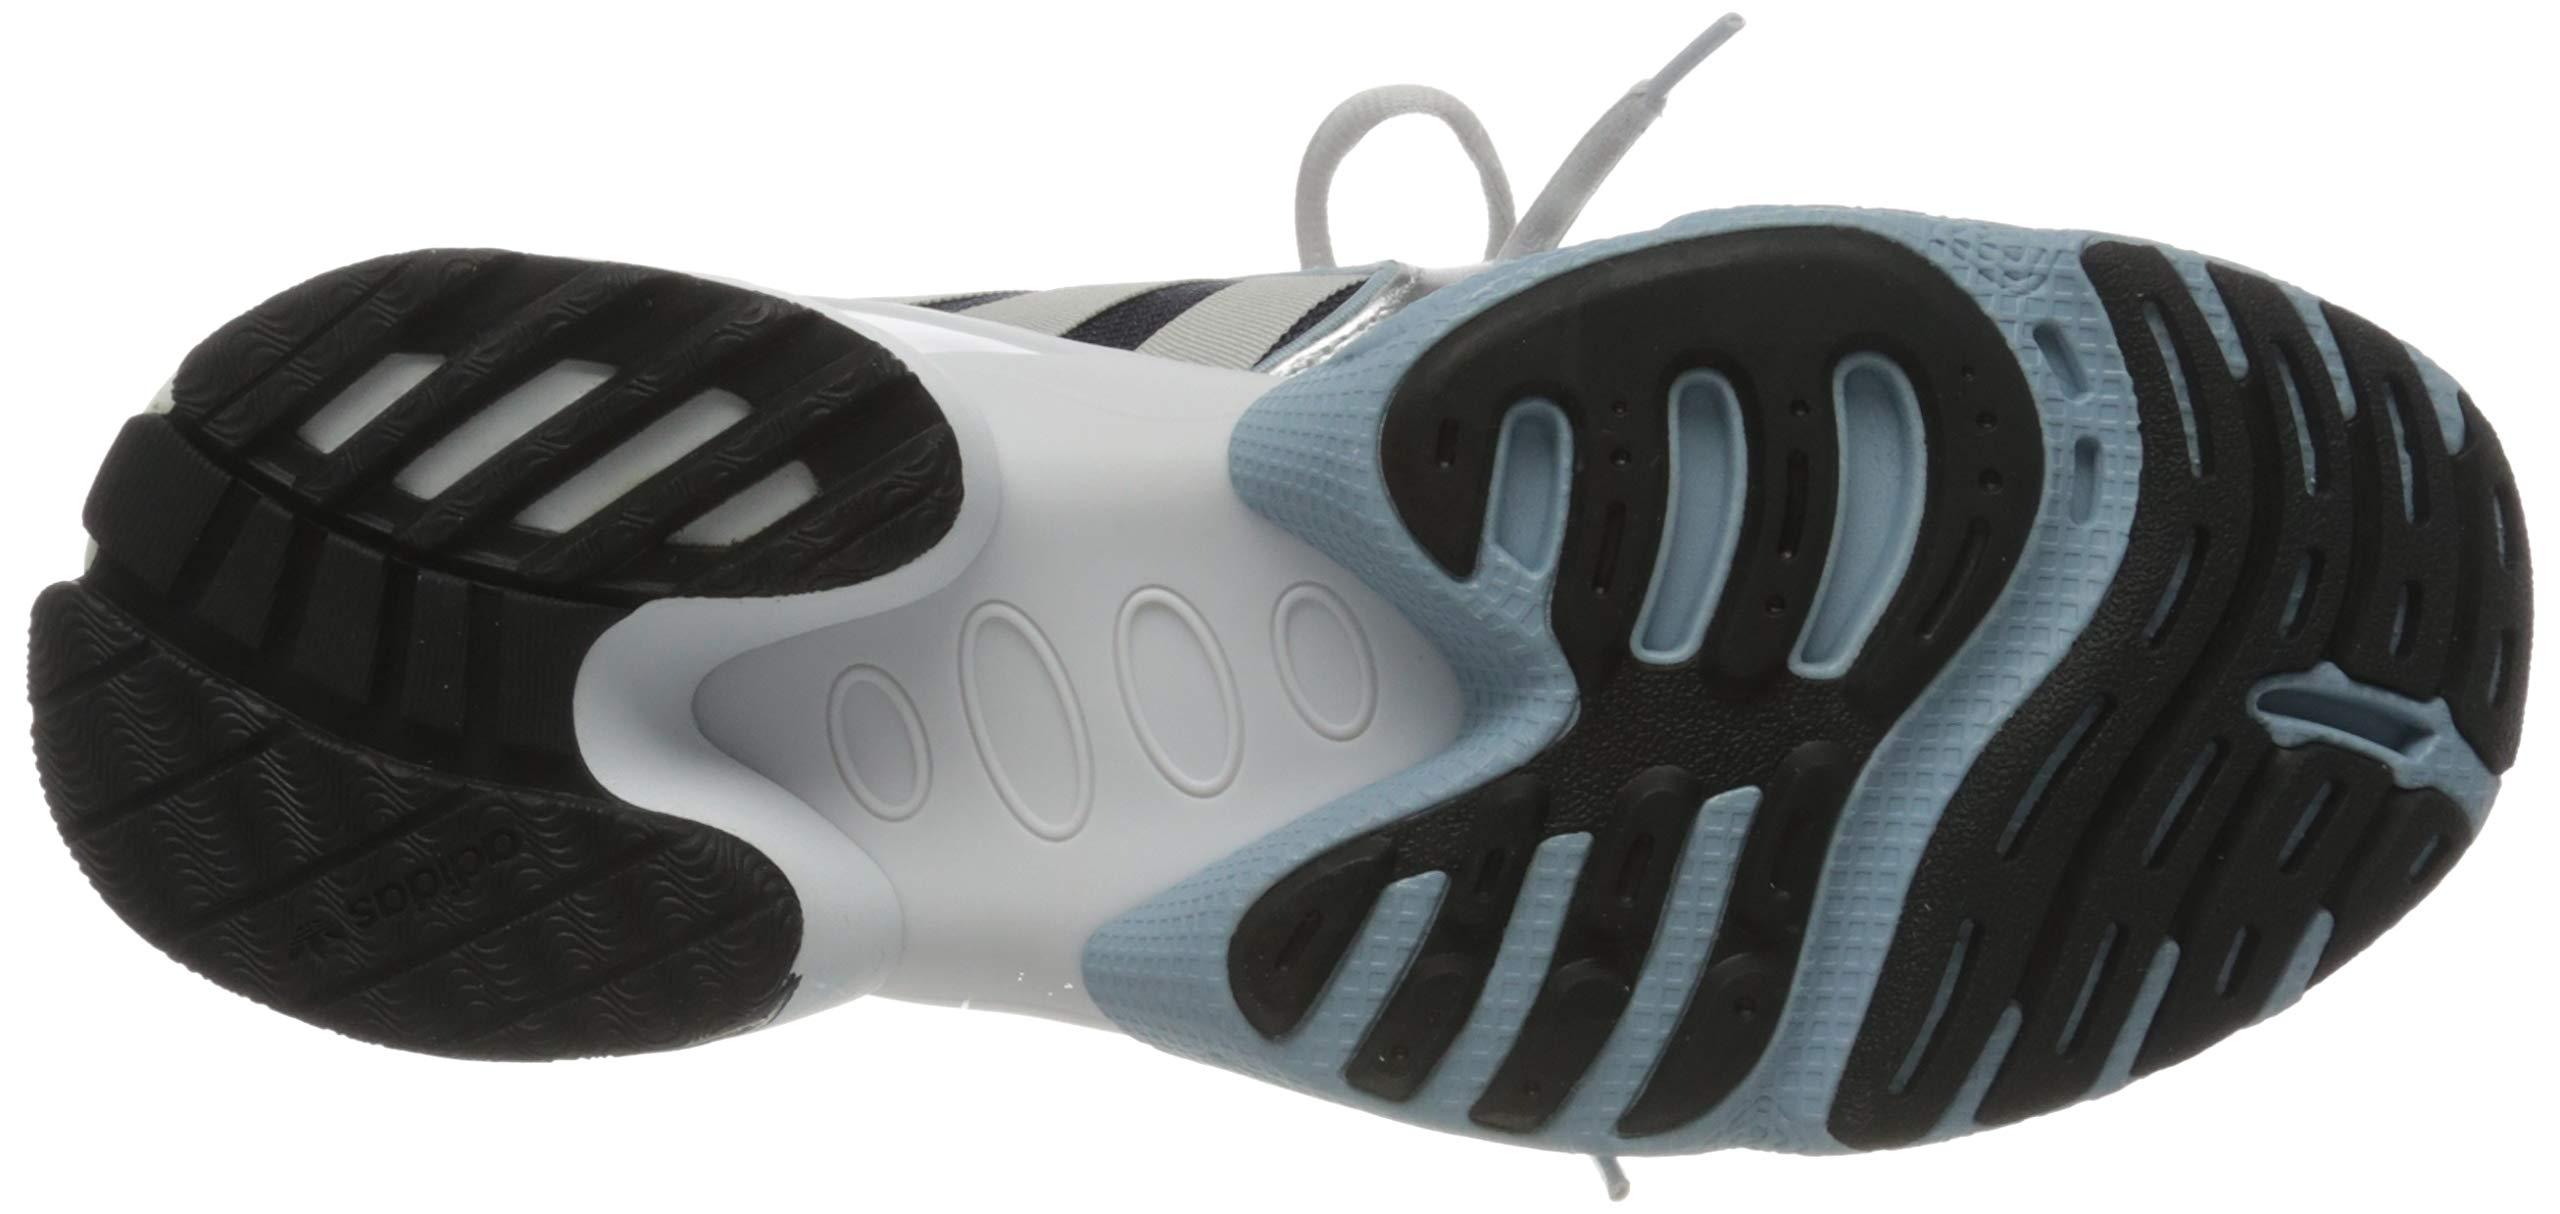 adidas EQT Gazelle, Scarpe da Ginnastica Uomo 3 spesavip